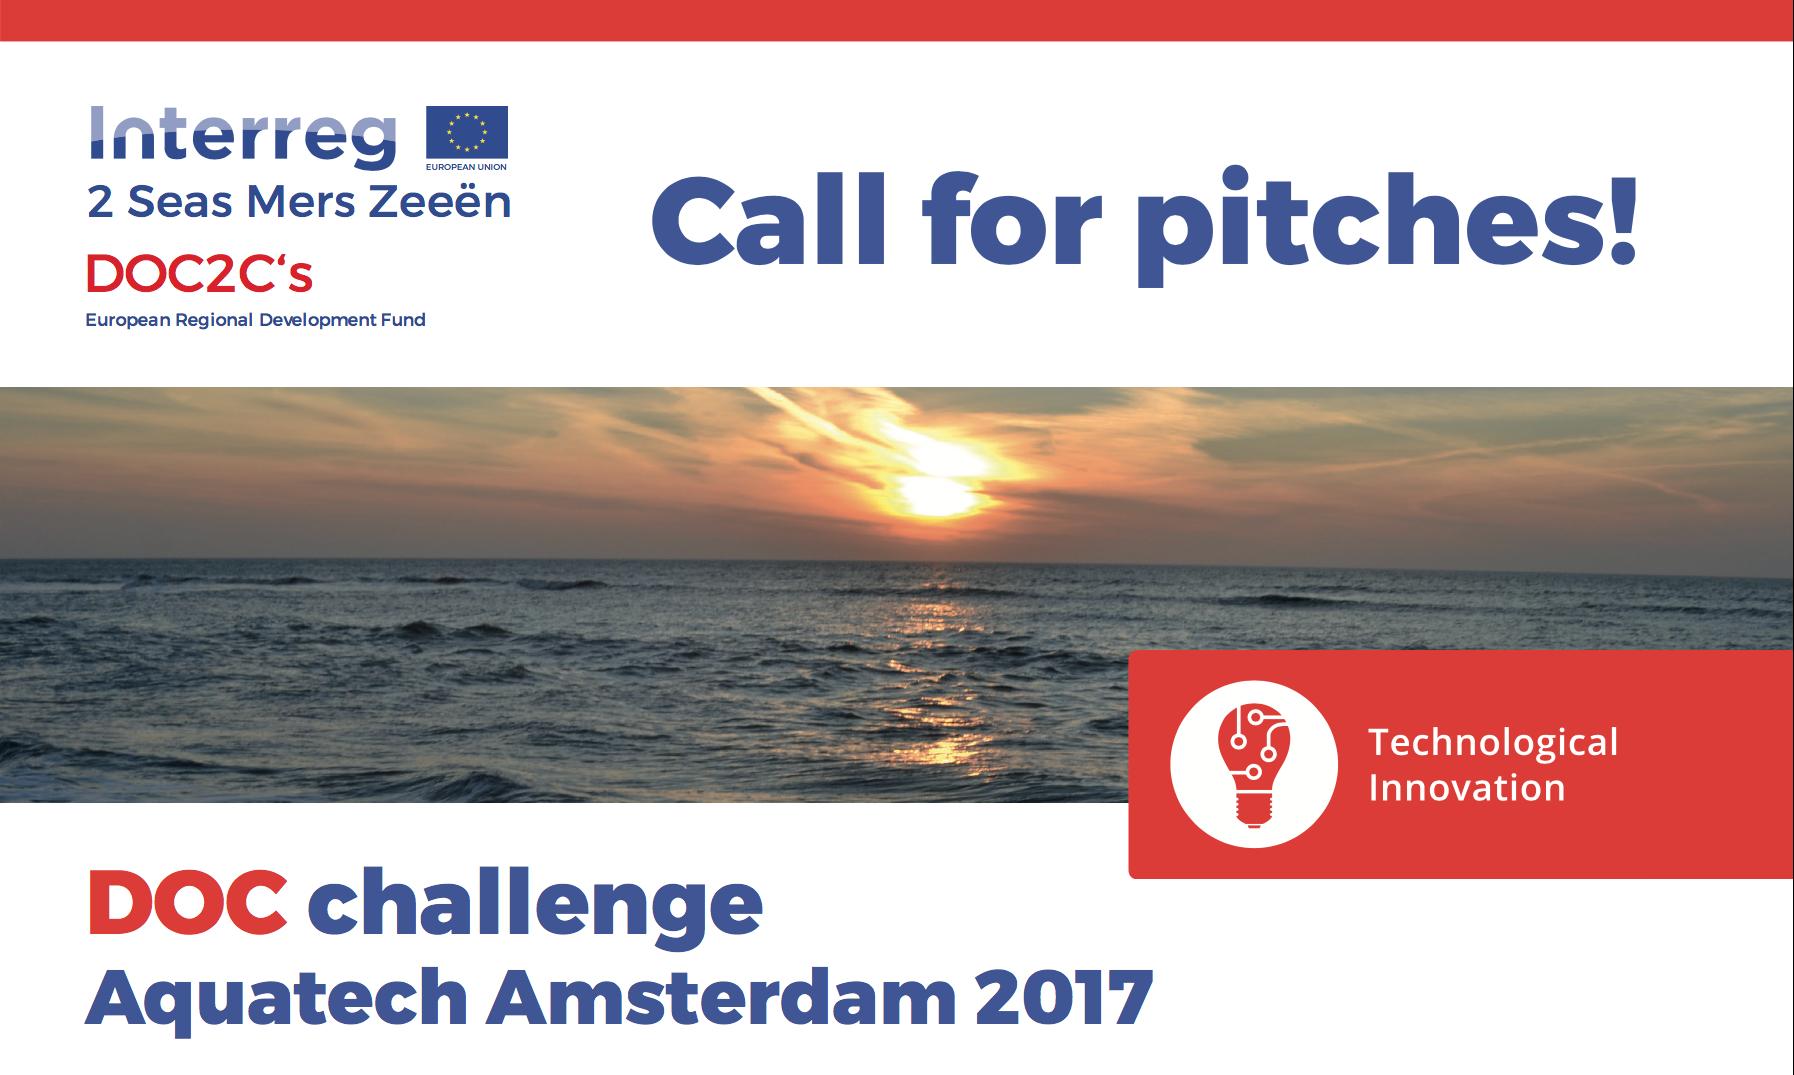 DOC Challenge Aquatech Amsterdam 2017